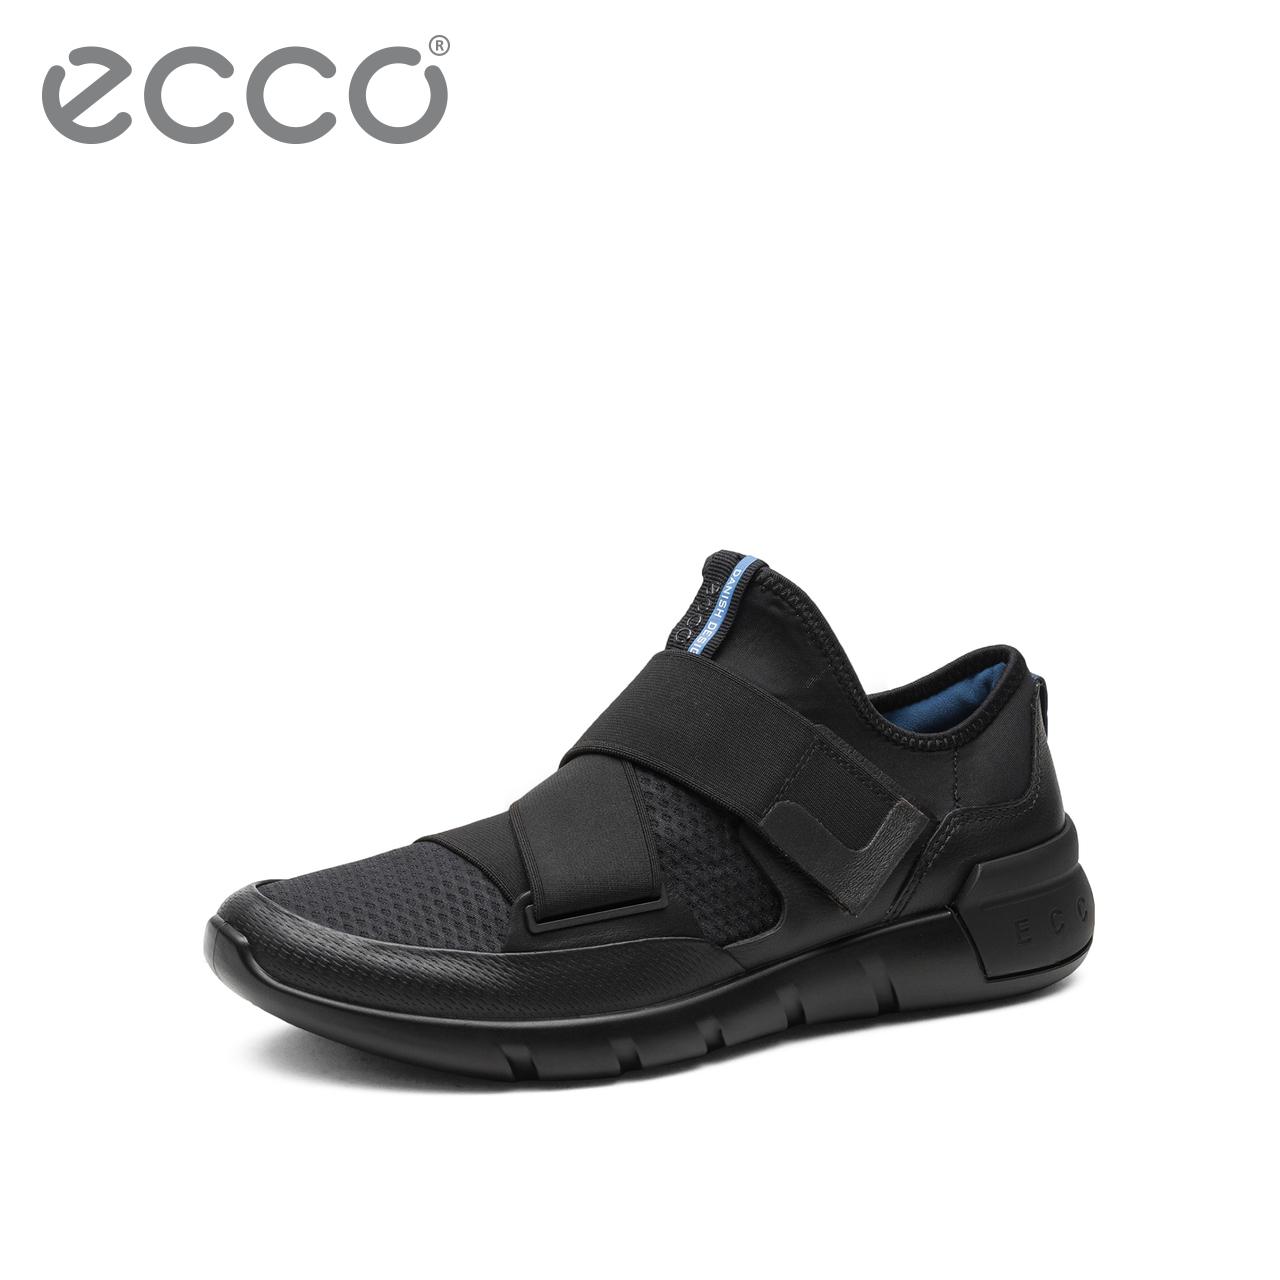 ECCO爱步春夏新品青年休闲鞋 时尚便捷魔术贴牛皮鞋 跨越X431534